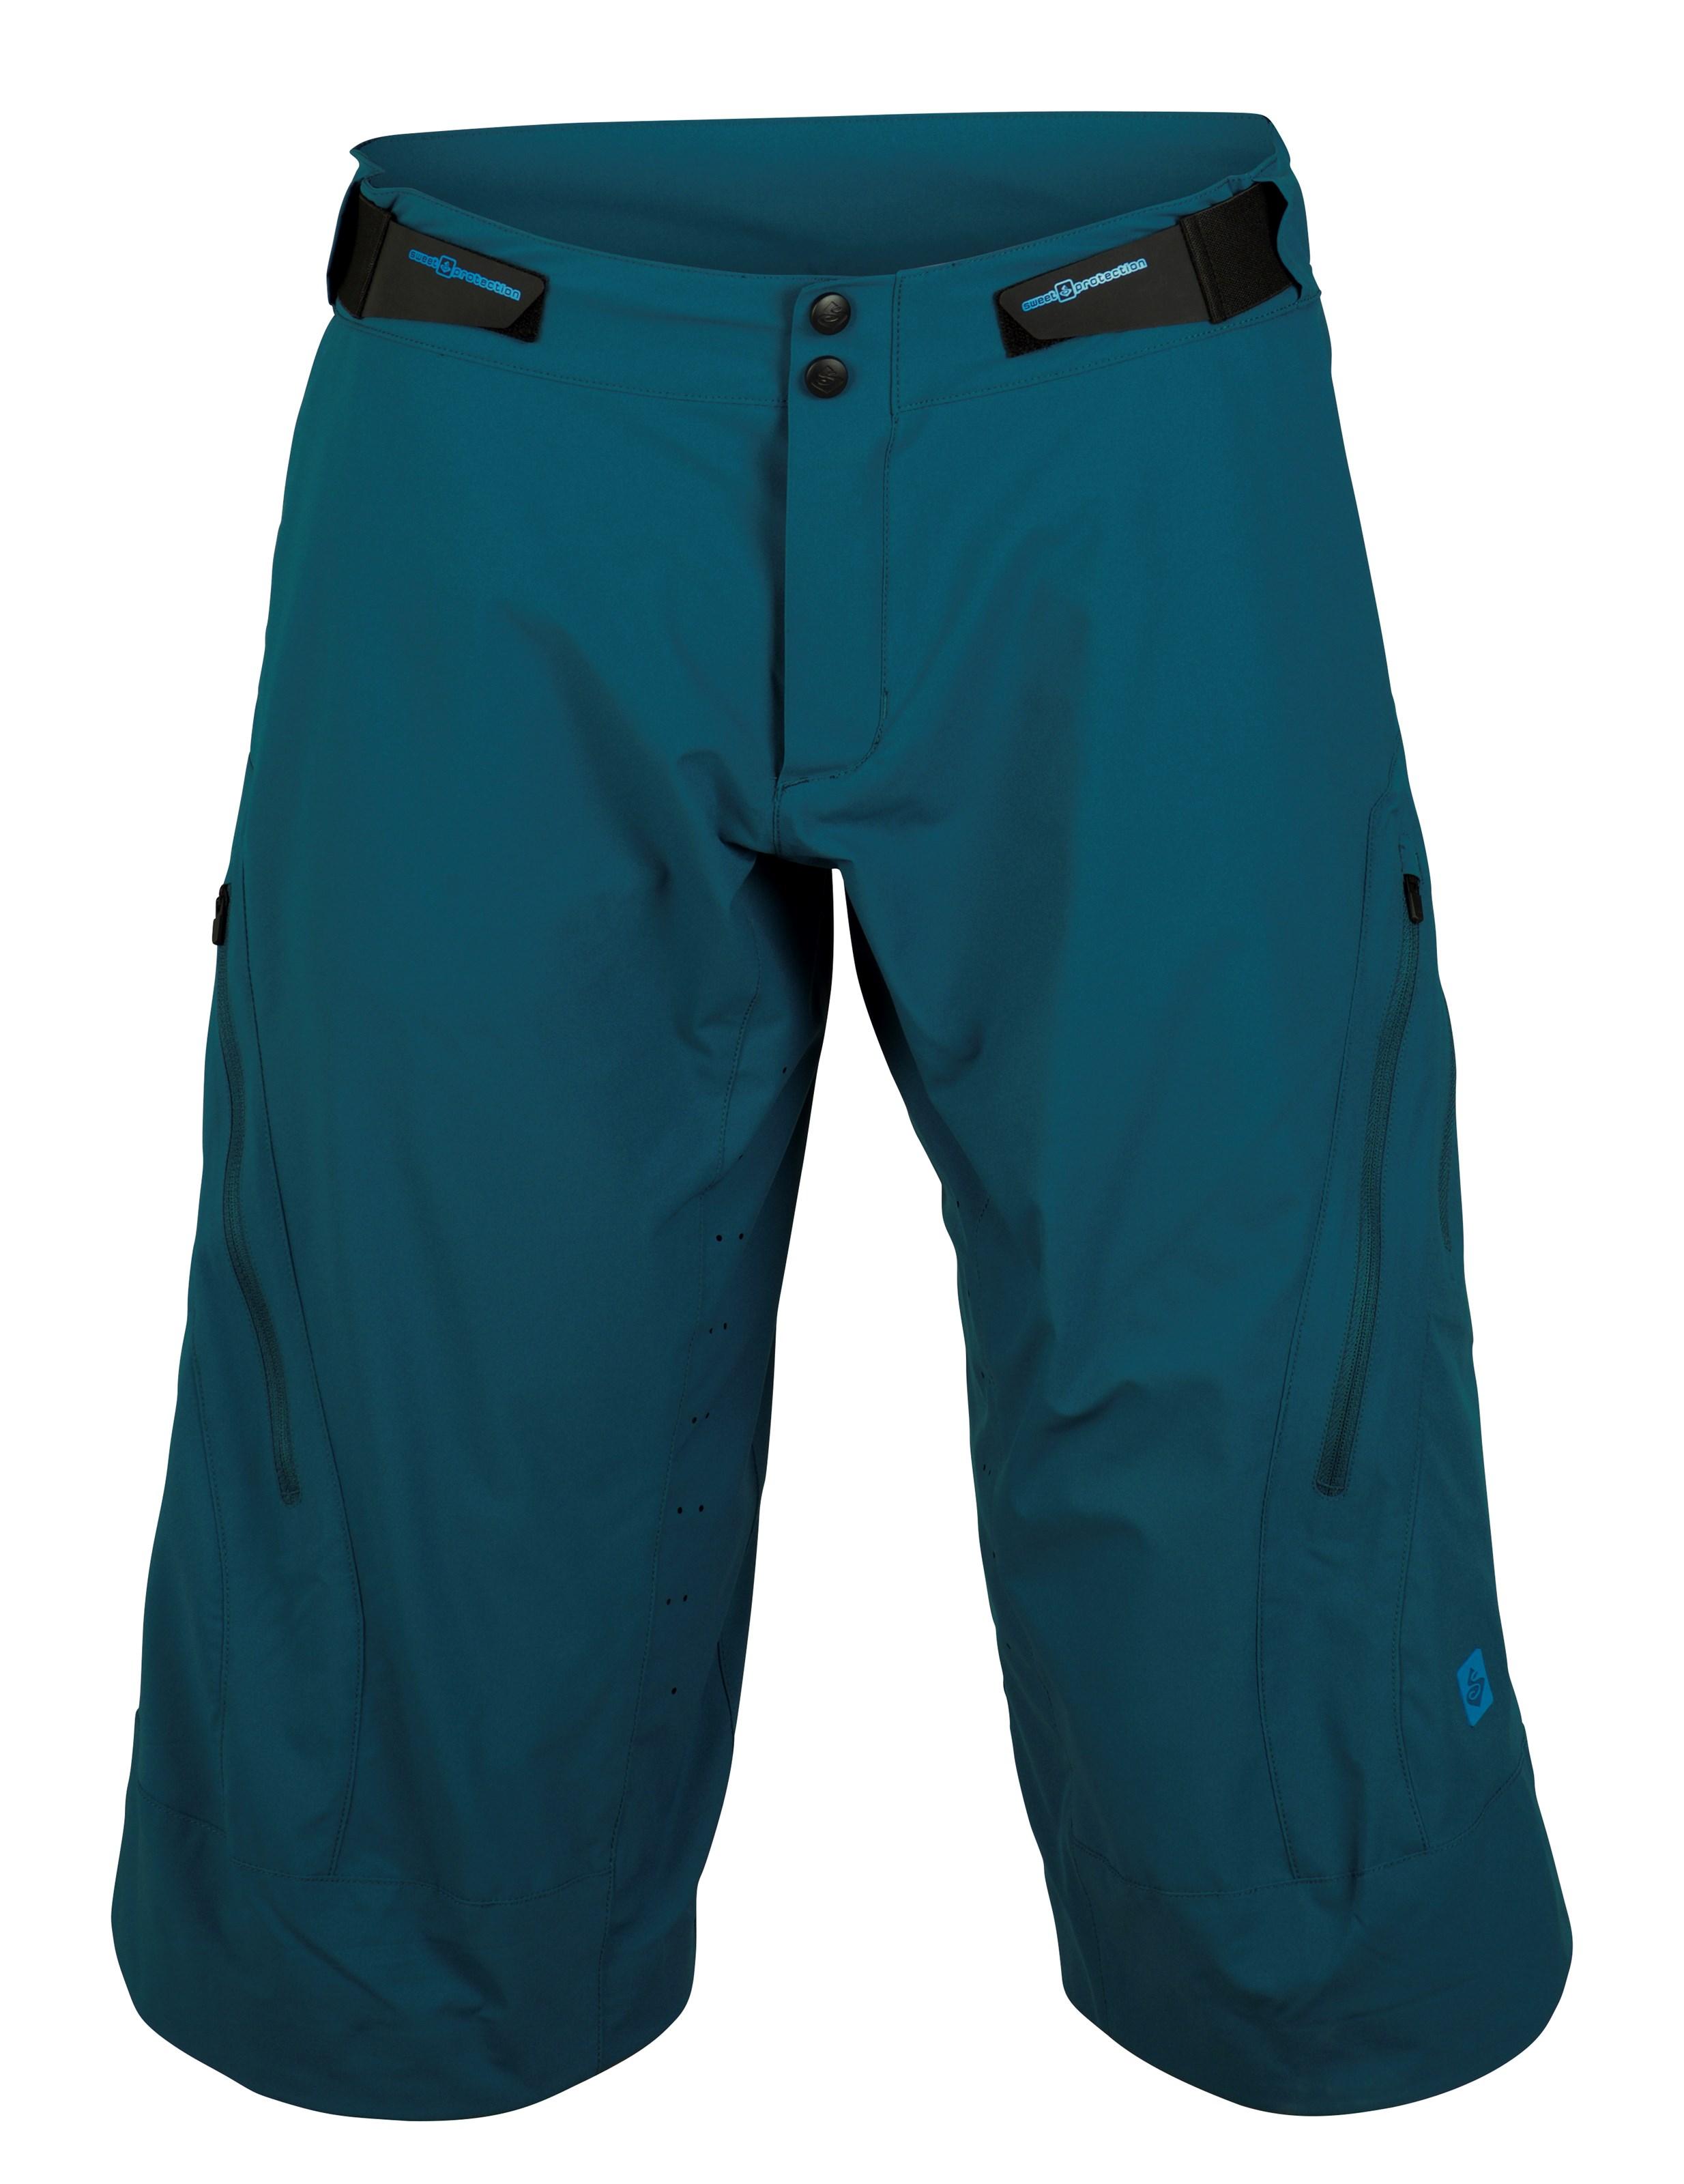 828061-hunter-enduro-shorts-dark_frost-front.jpg